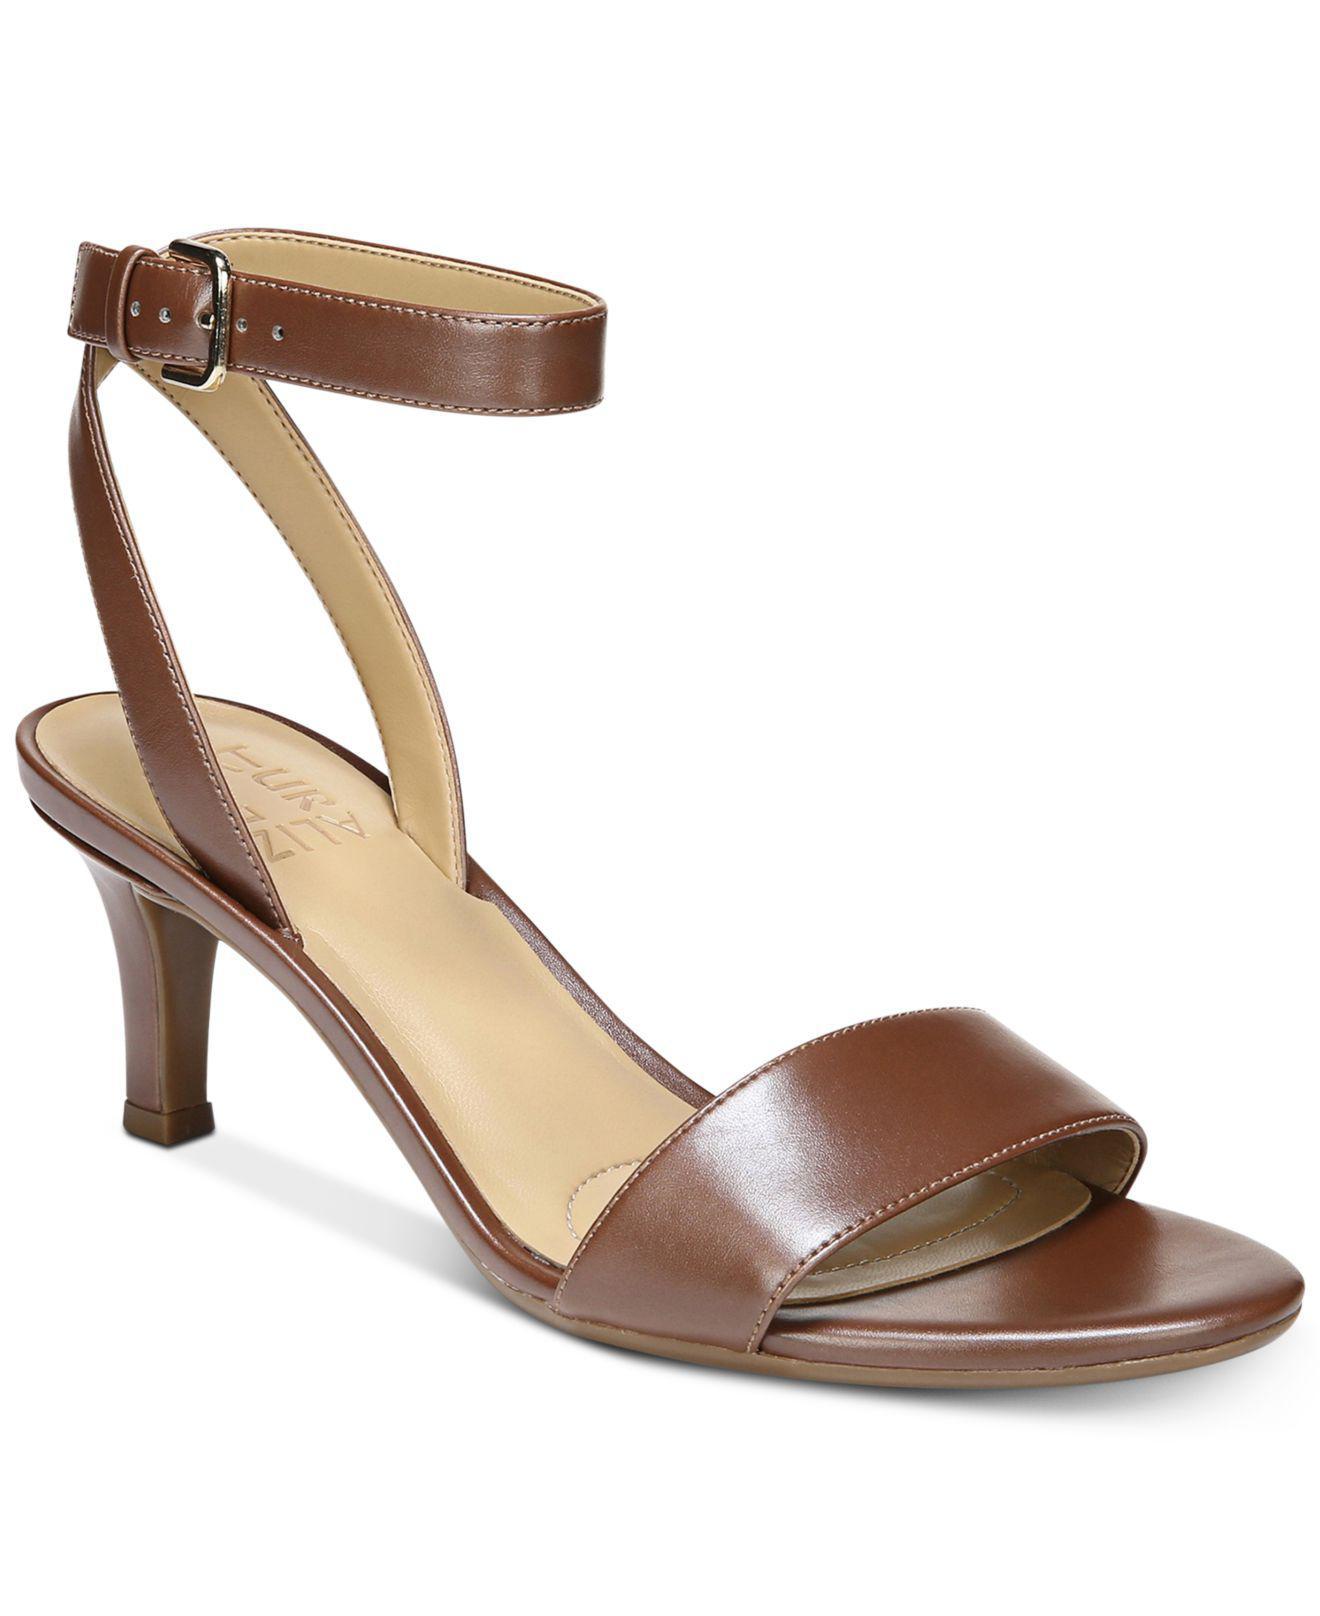 1a6132134d27 Lyst - Naturalizer Tinda Dress Sandals in Brown